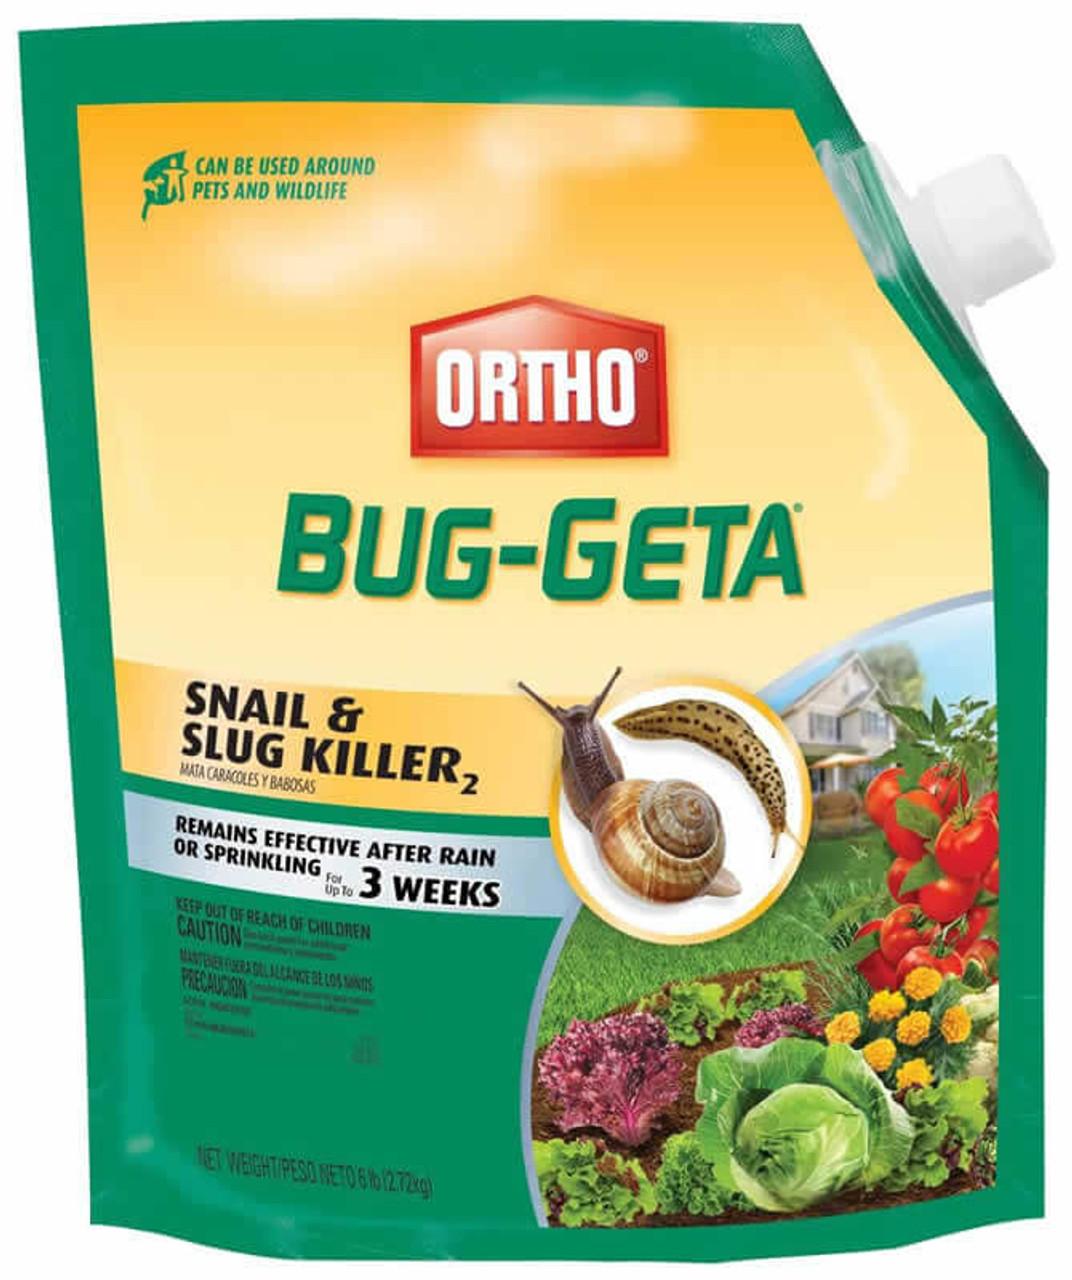 Ortho Bug-Getta Slug & Snail Killer 2 Pounds